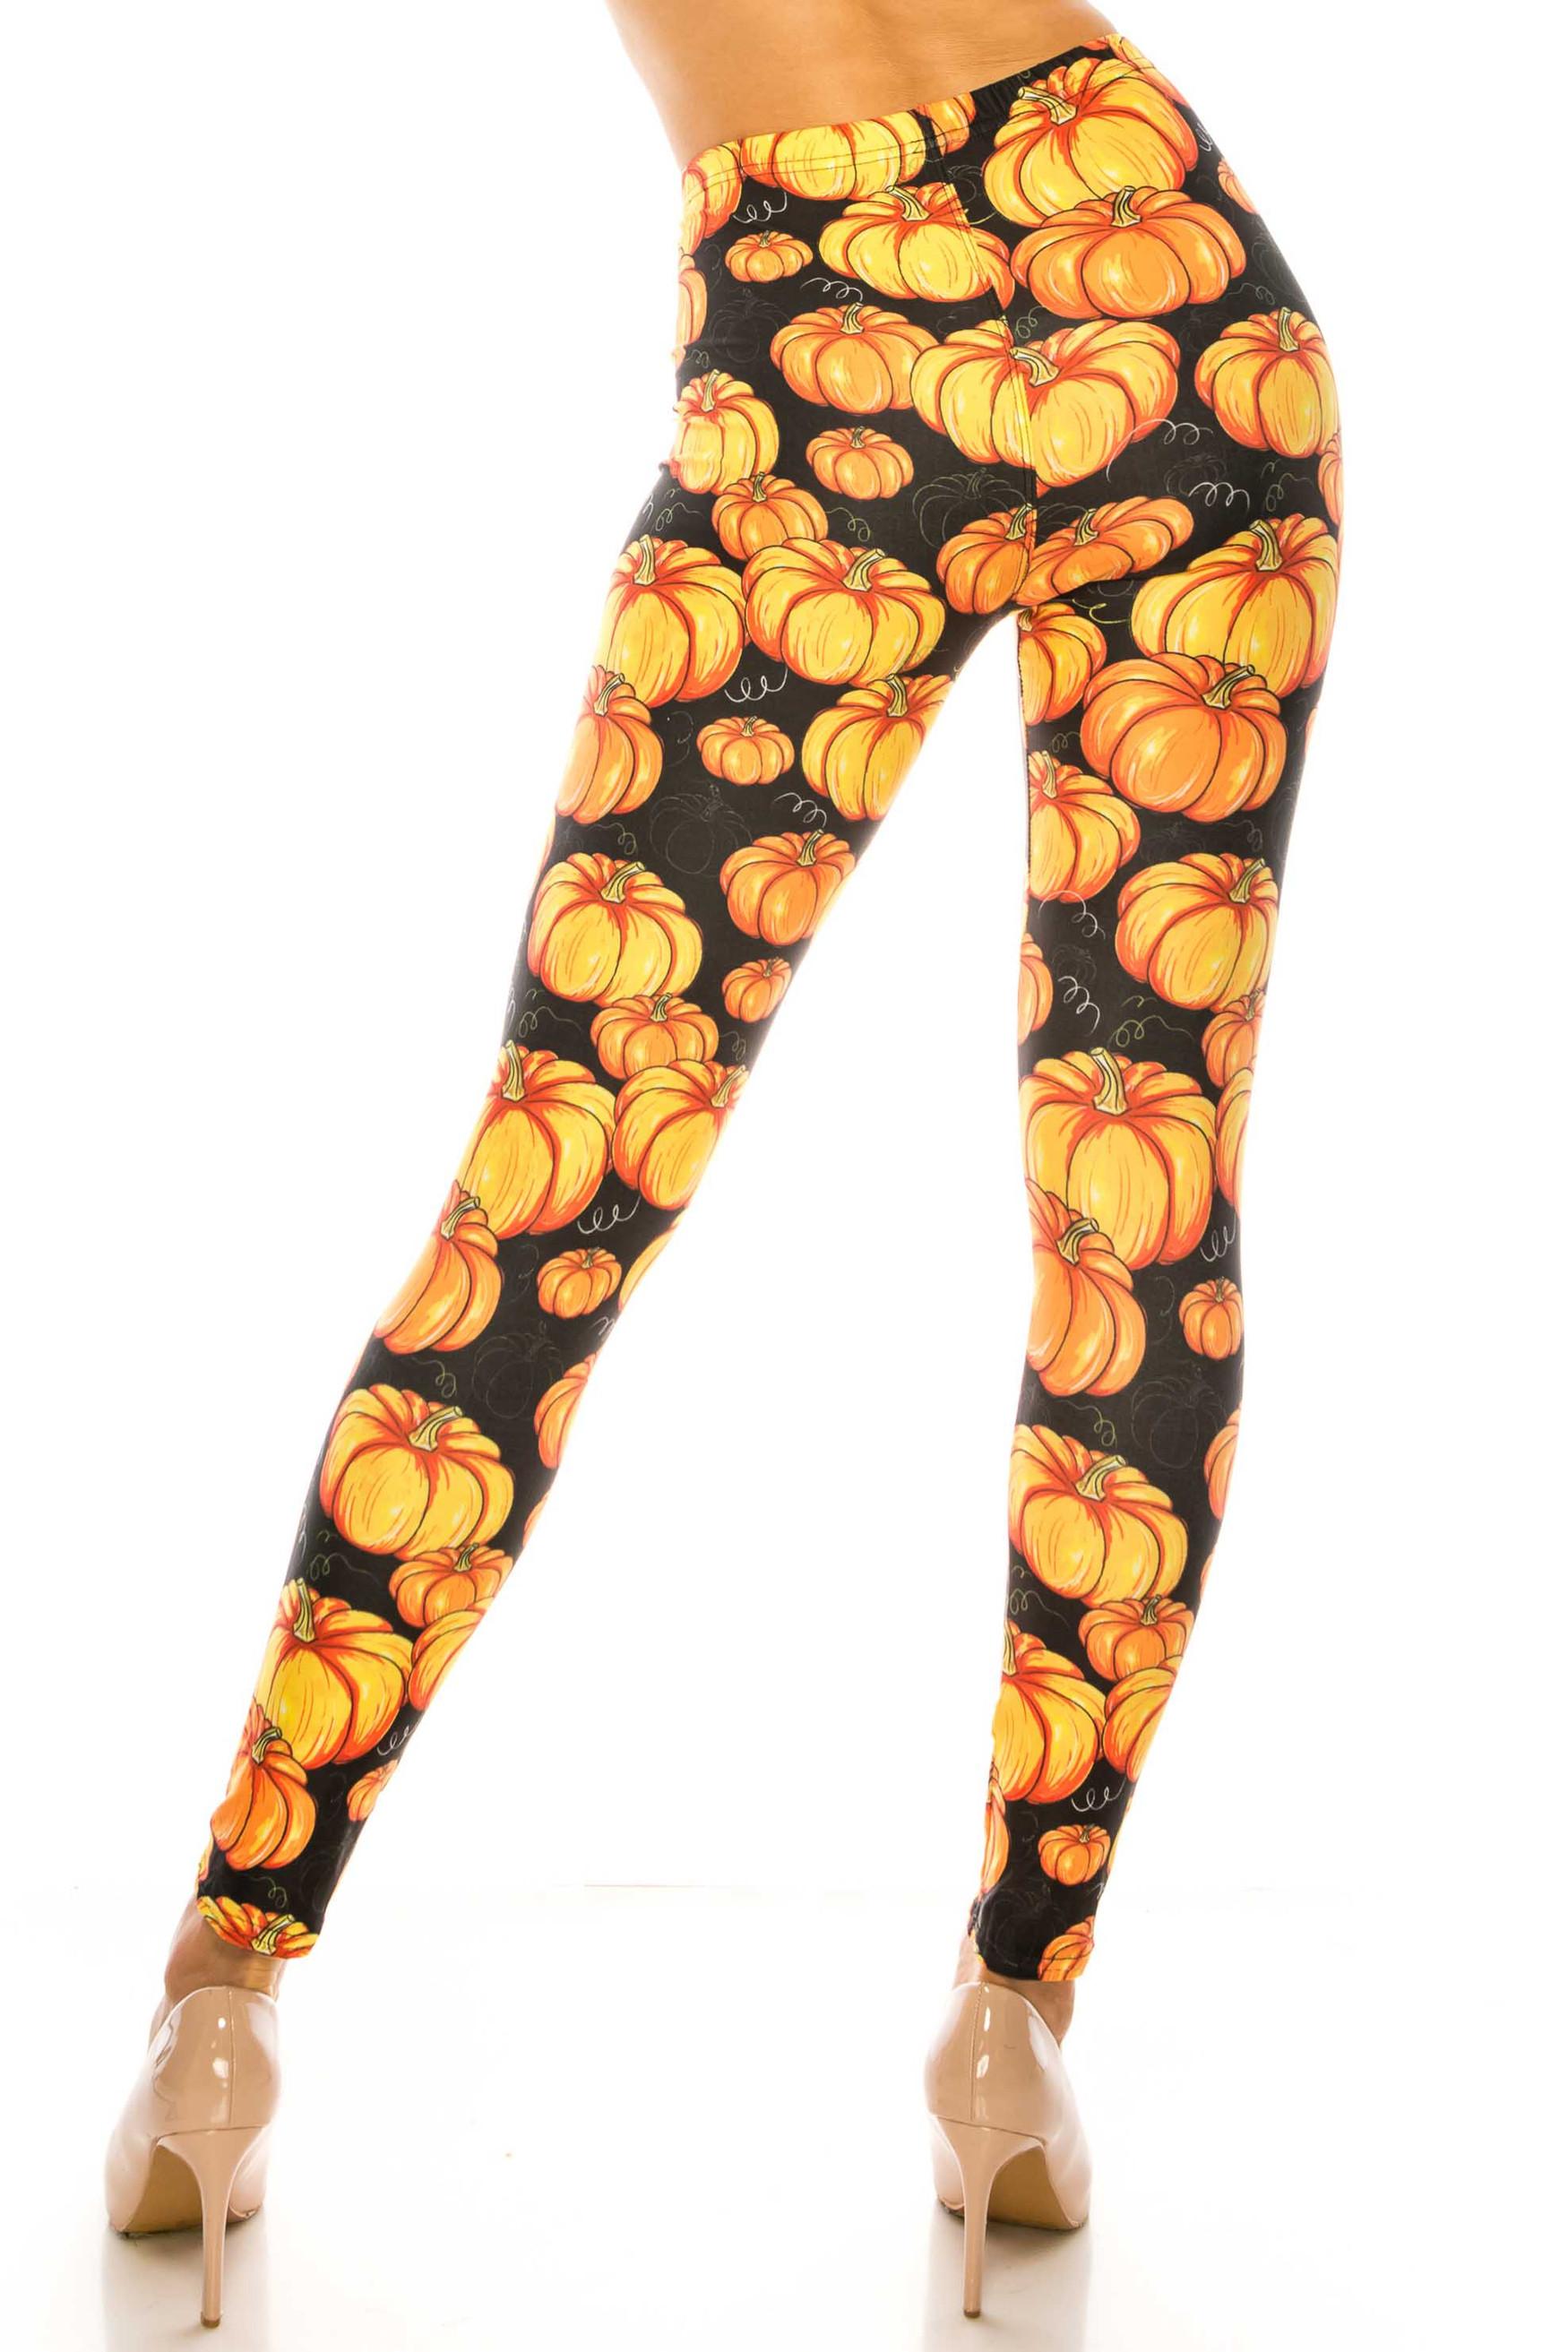 Creamy Soft Autumnal Pumpkins Plus Size Leggings - USA Fashion™